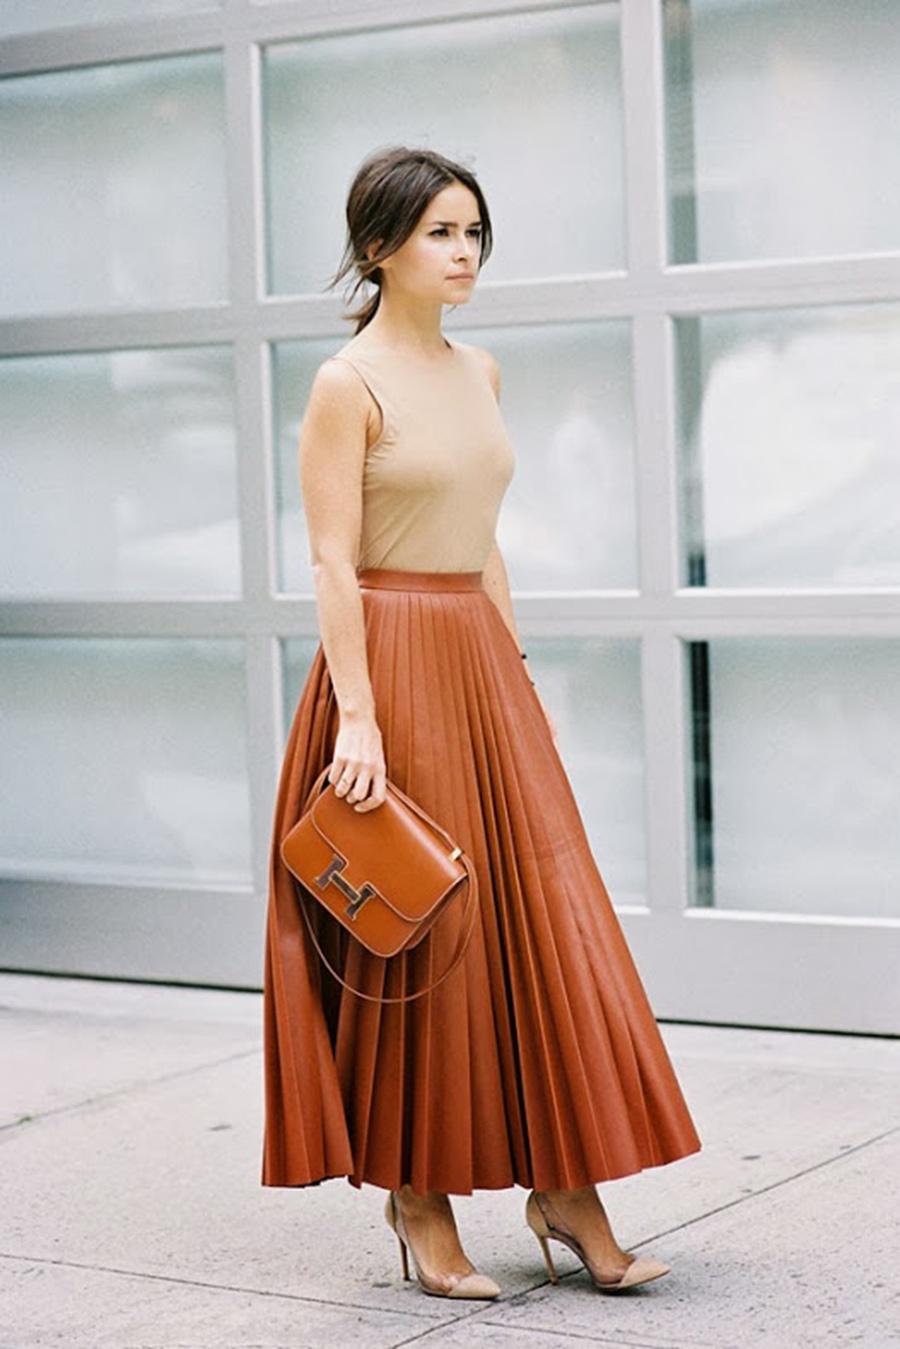 Brown-Hermes-Constance-Handbag-Pleated-Leather-Skirt